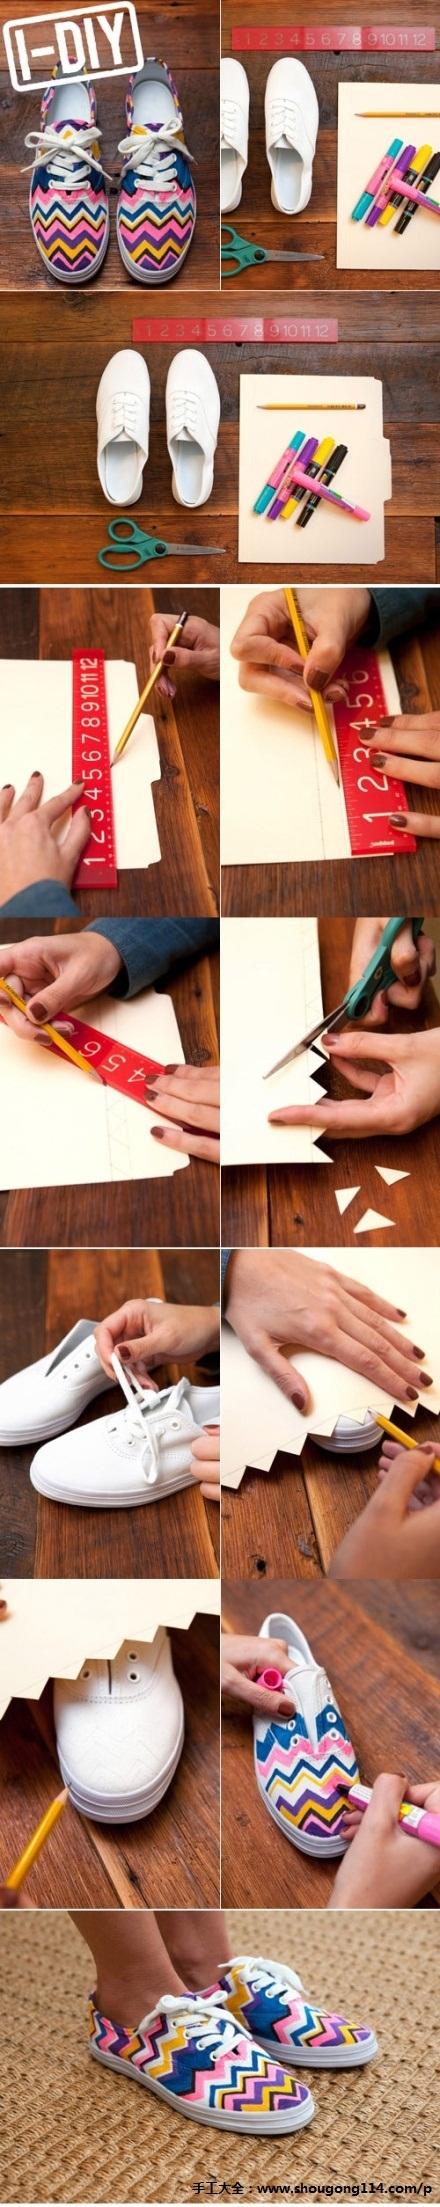 Very creative :)